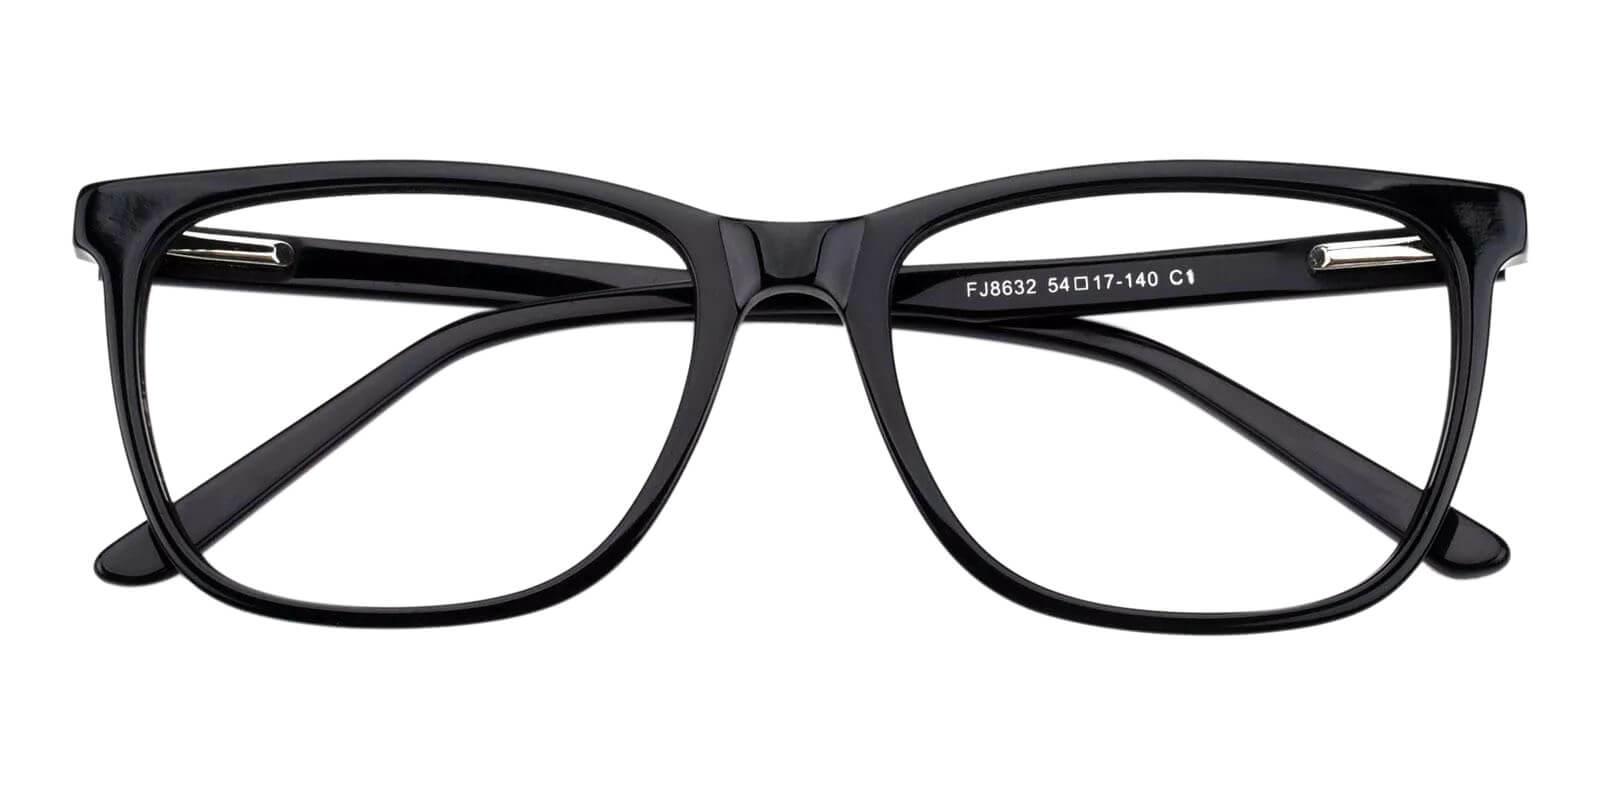 Gulio Black Acetate Eyeglasses , Fashion , SpringHinges , UniversalBridgeFit Frames from ABBE Glasses